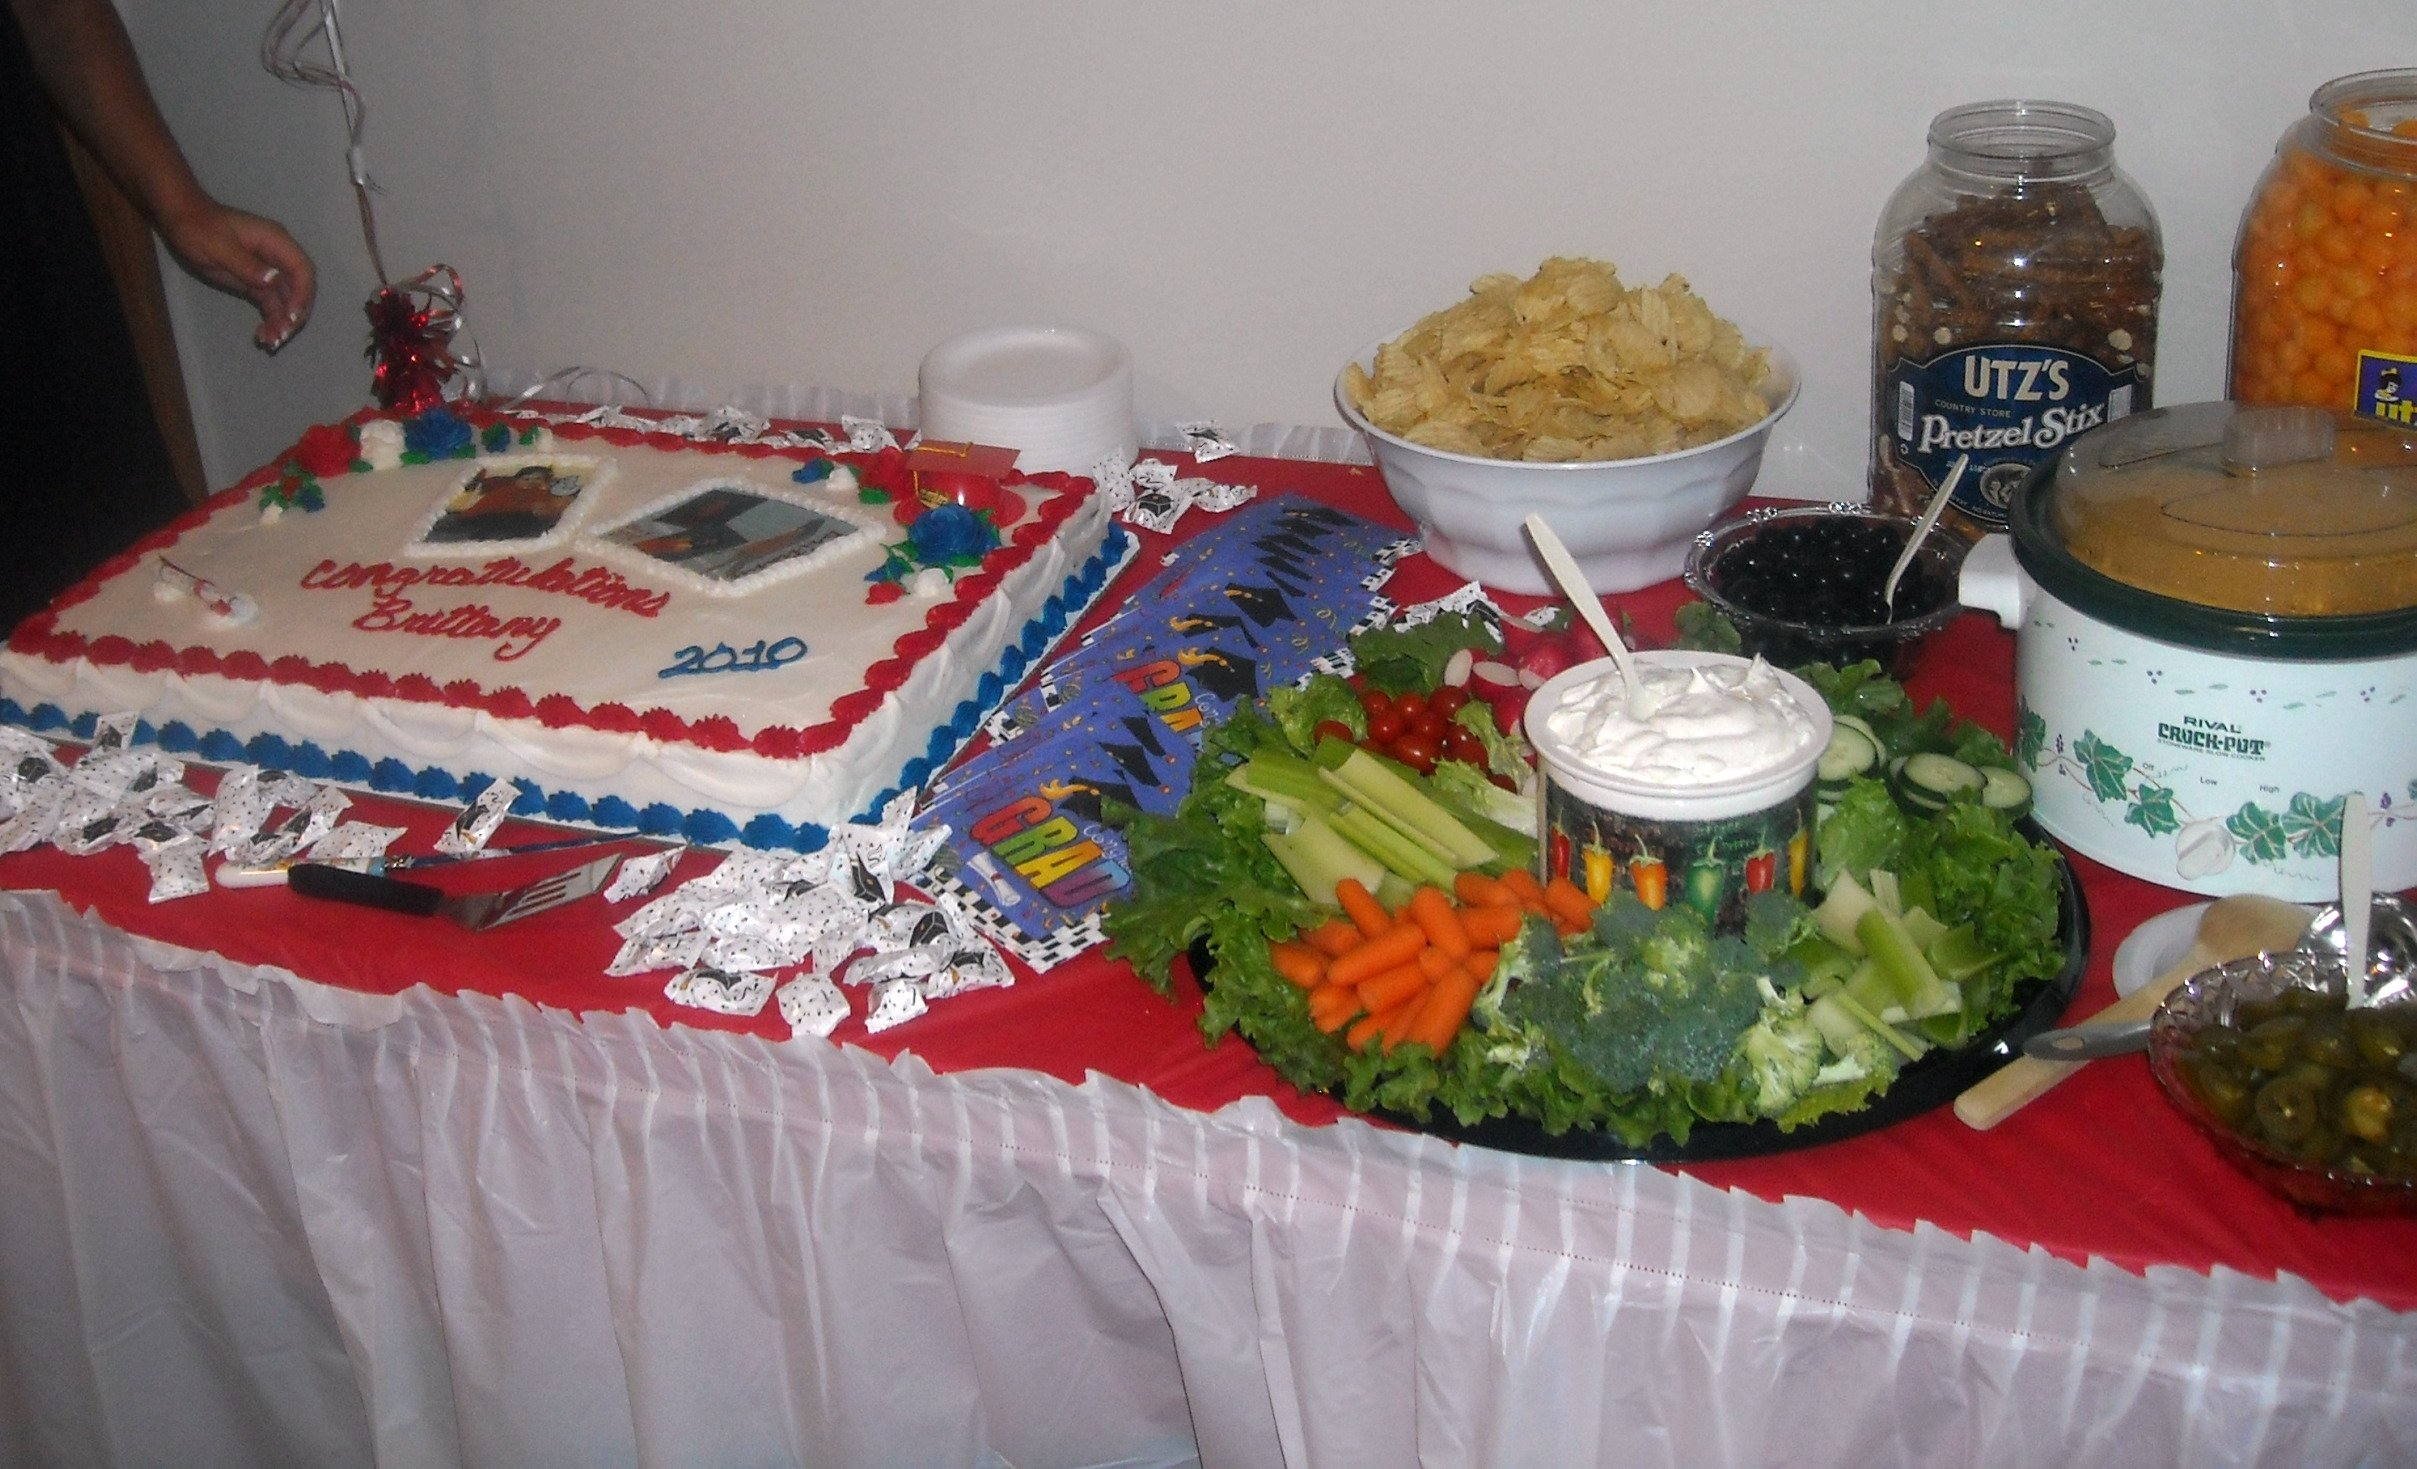 10 Stylish Graduation Open House Menu Ideas pool colorful grad party decorations to host an graduation 2021